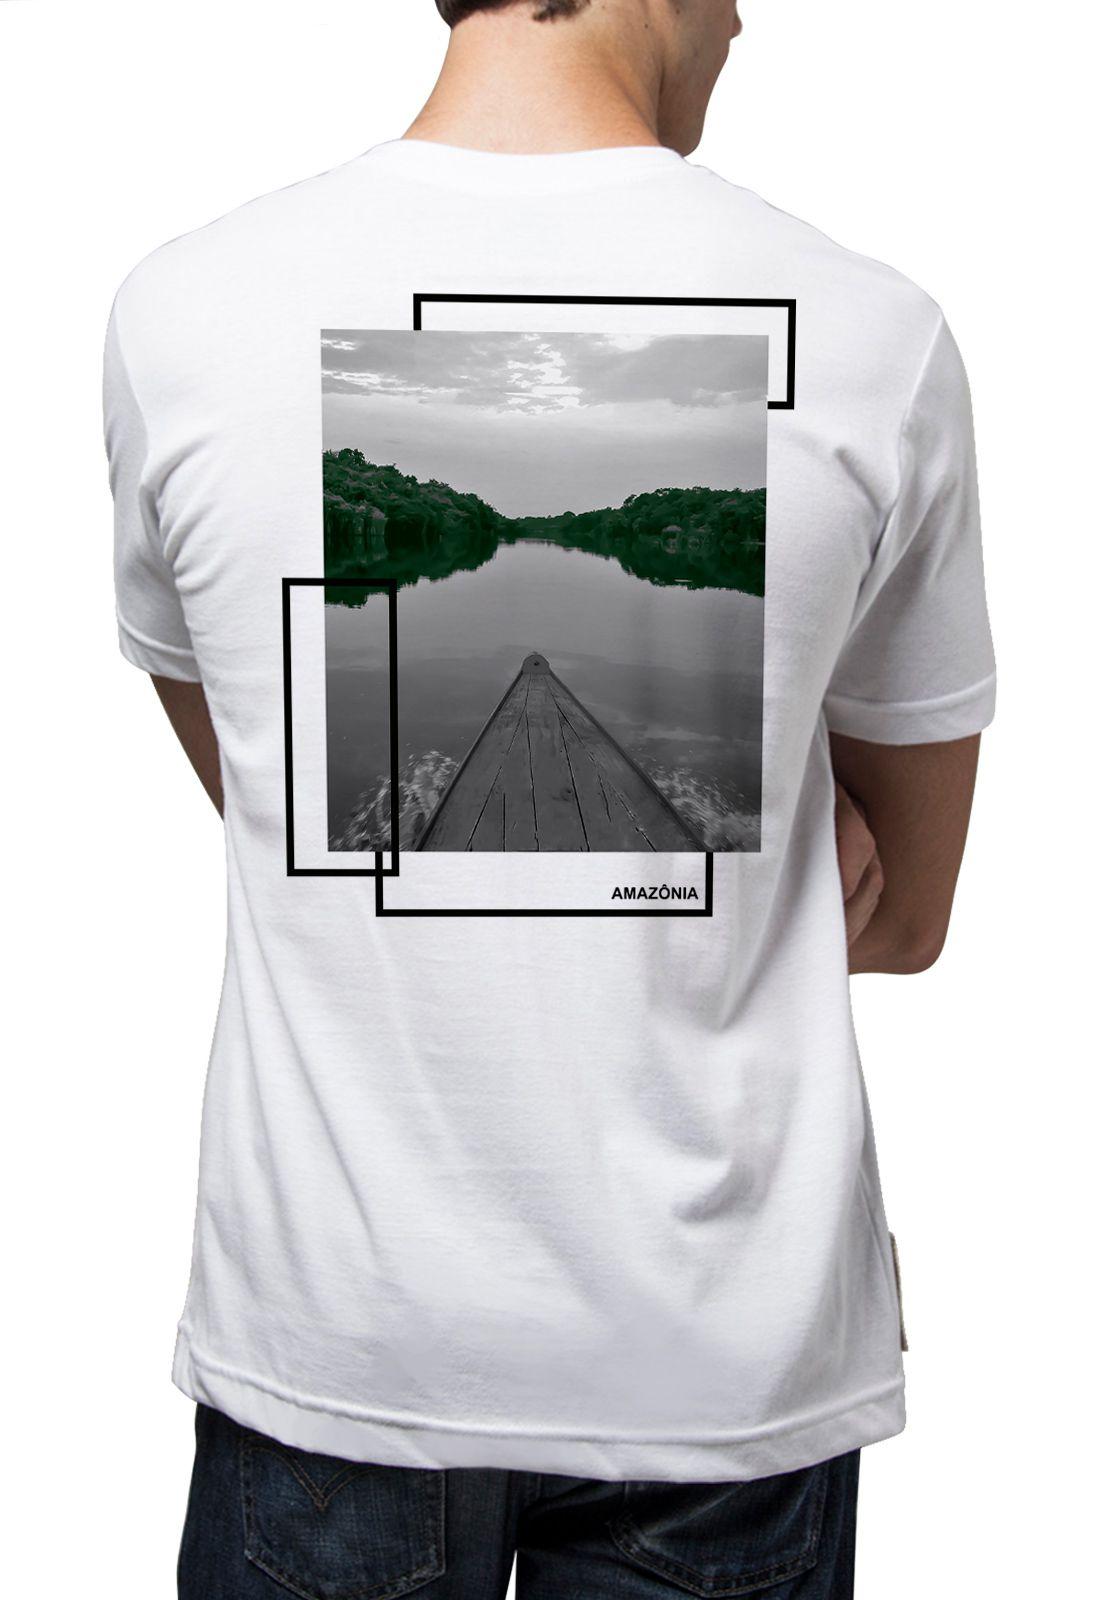 Camiseta Amazônia Navegando pelo Rio Amazonas - Branco